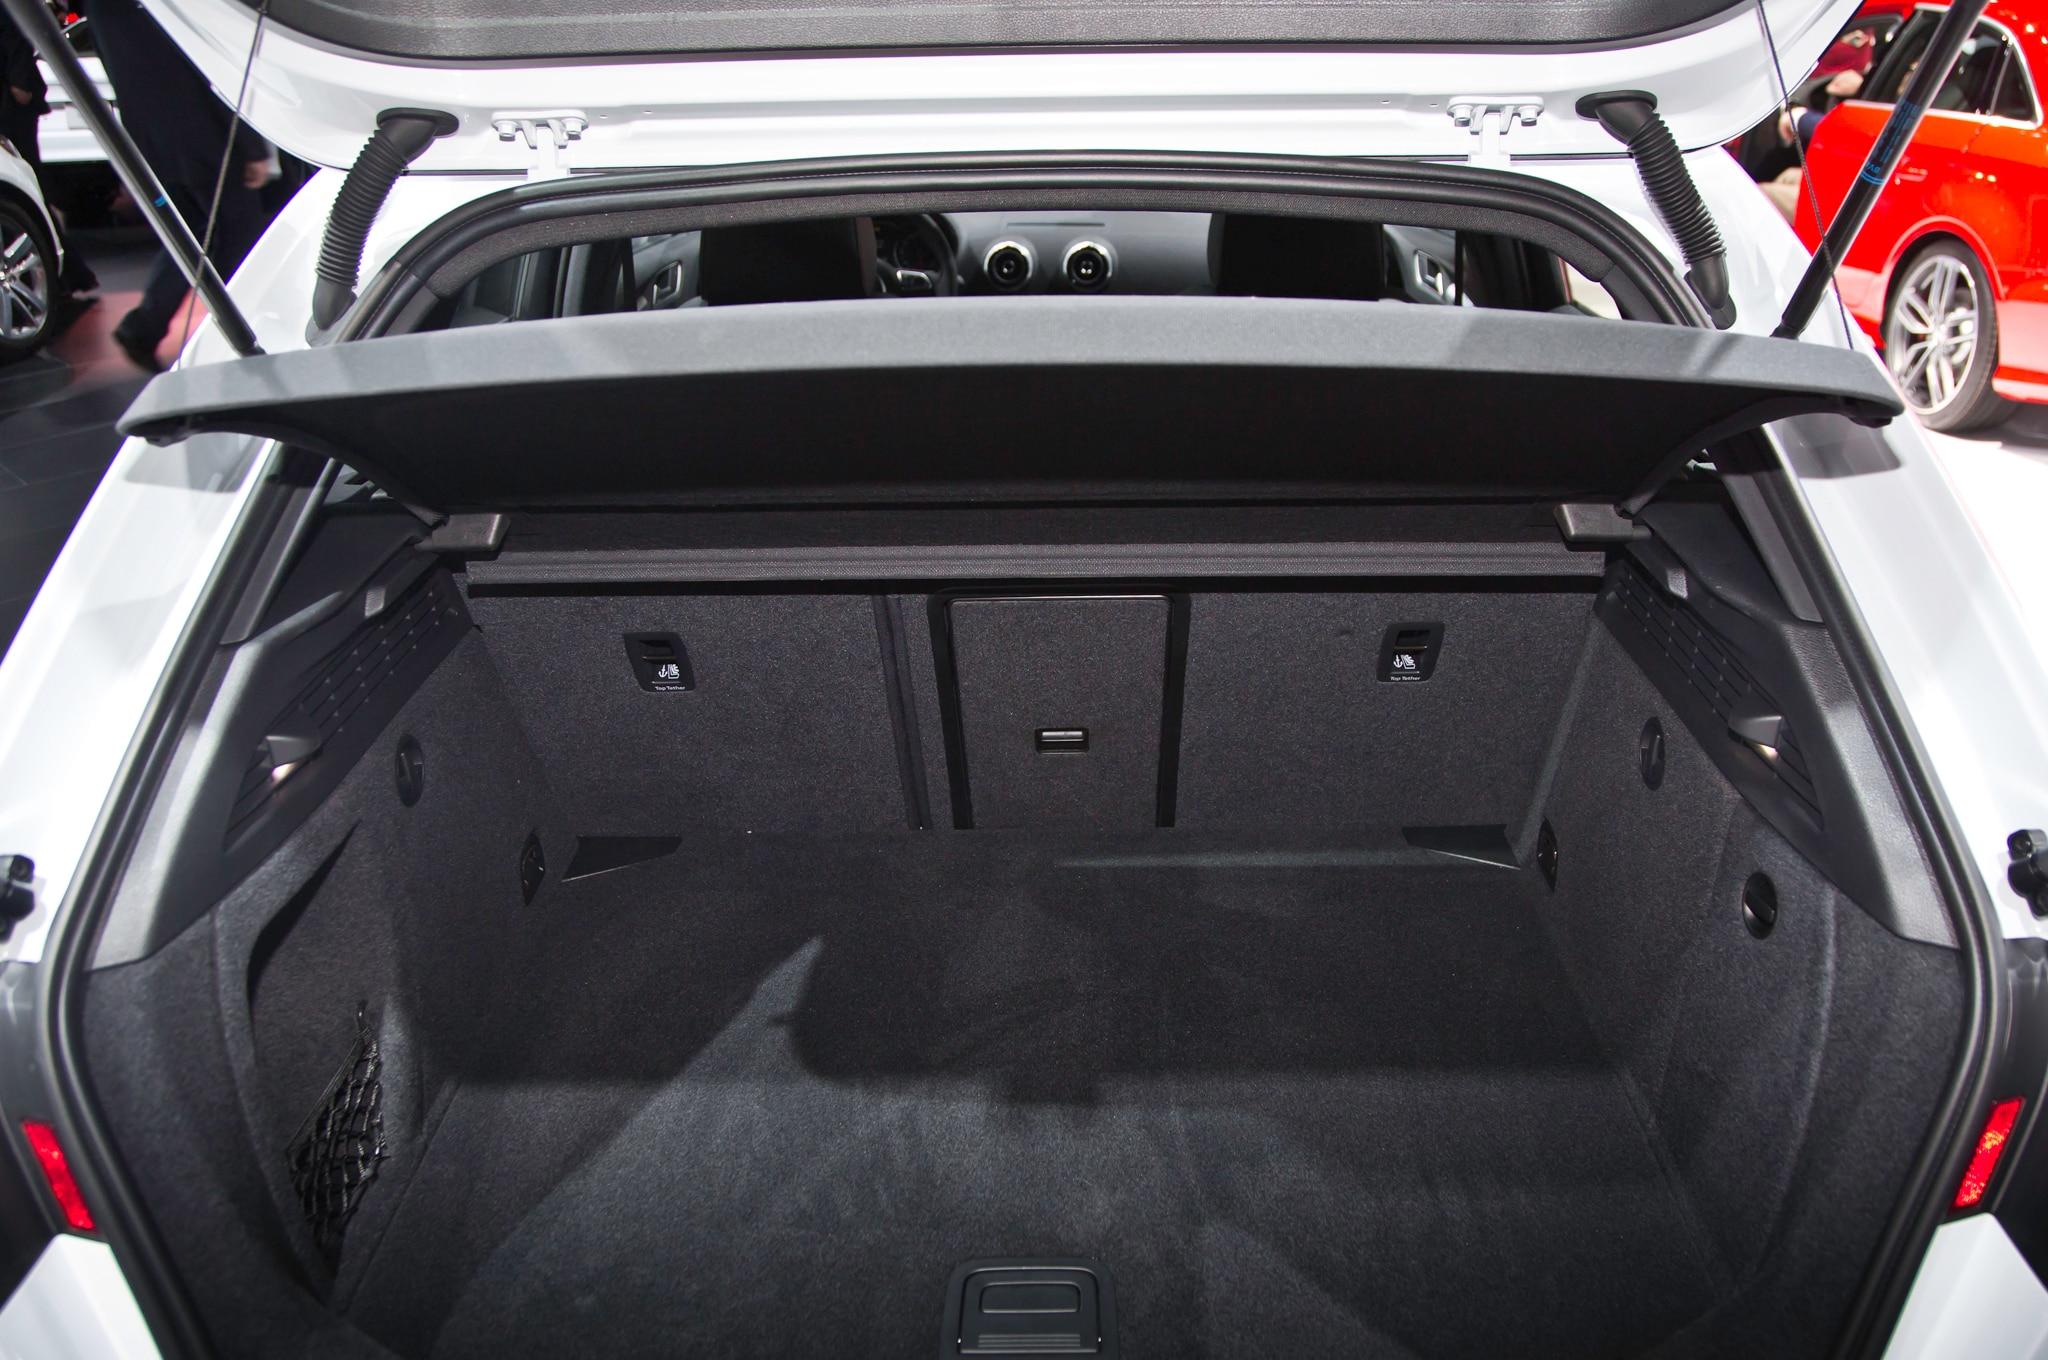 2016 audi a3 tdi hatchback joins lineup automobile magazine. Black Bedroom Furniture Sets. Home Design Ideas